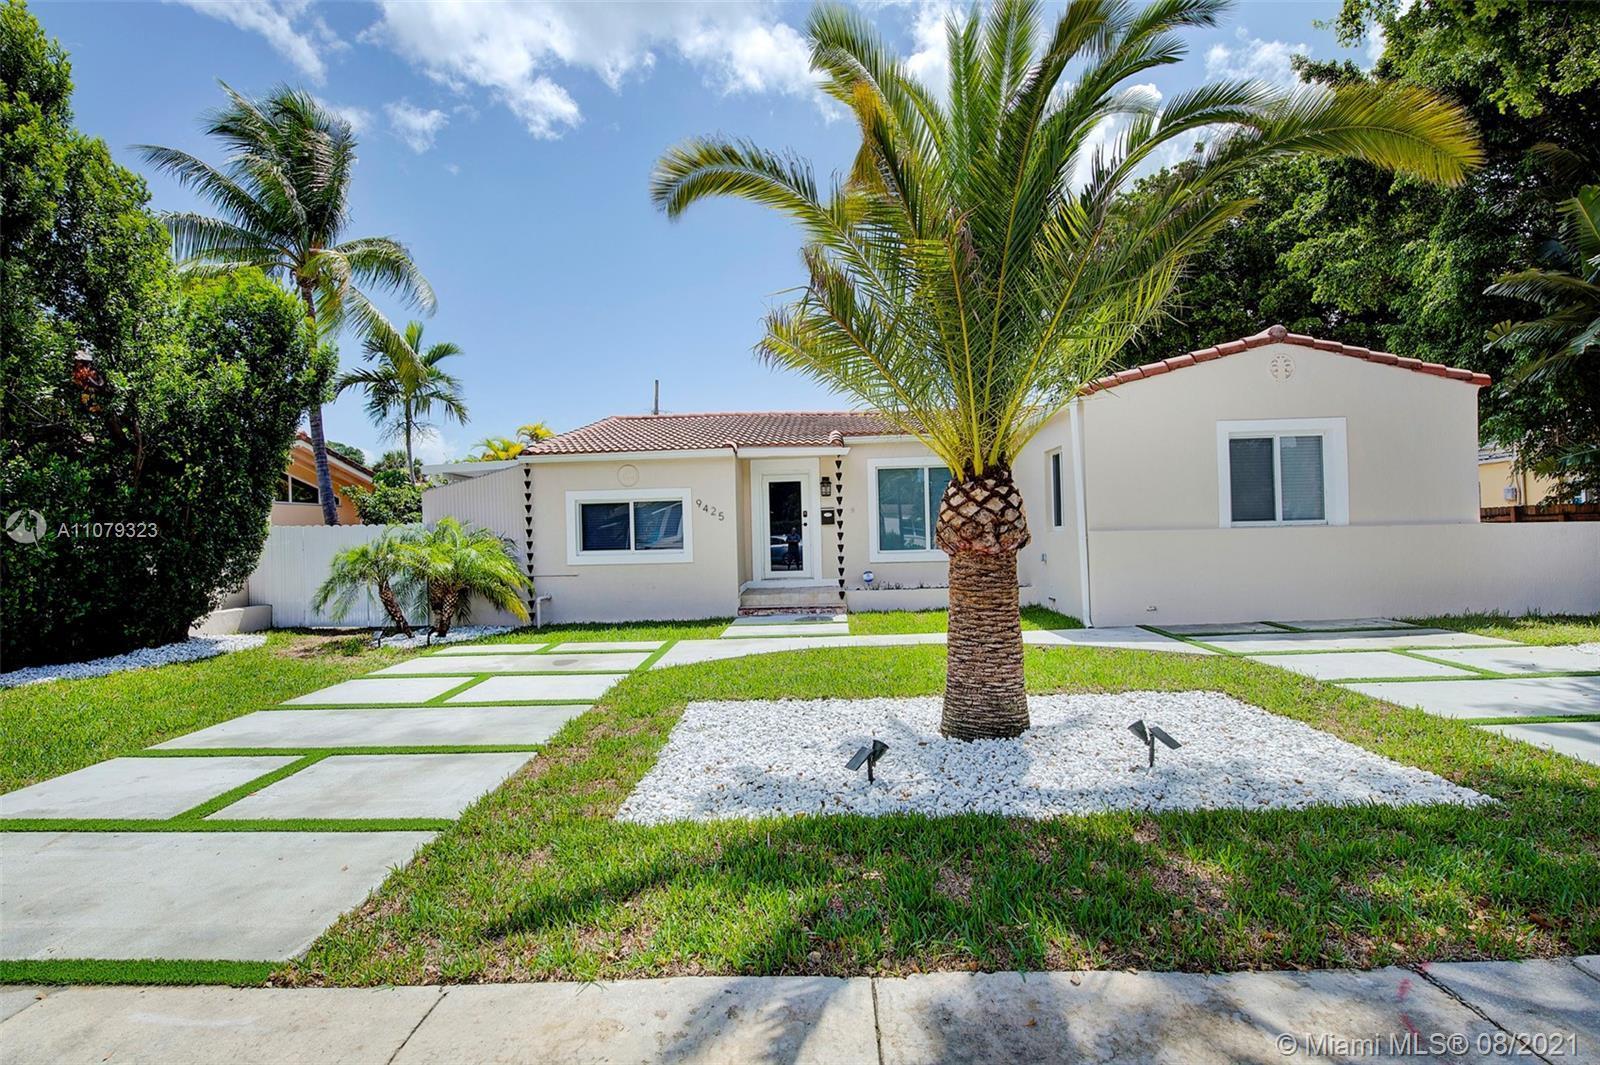 Miami Shores living at its best in this bigger than tax roll 3/2 plus bonus room under air! Surround